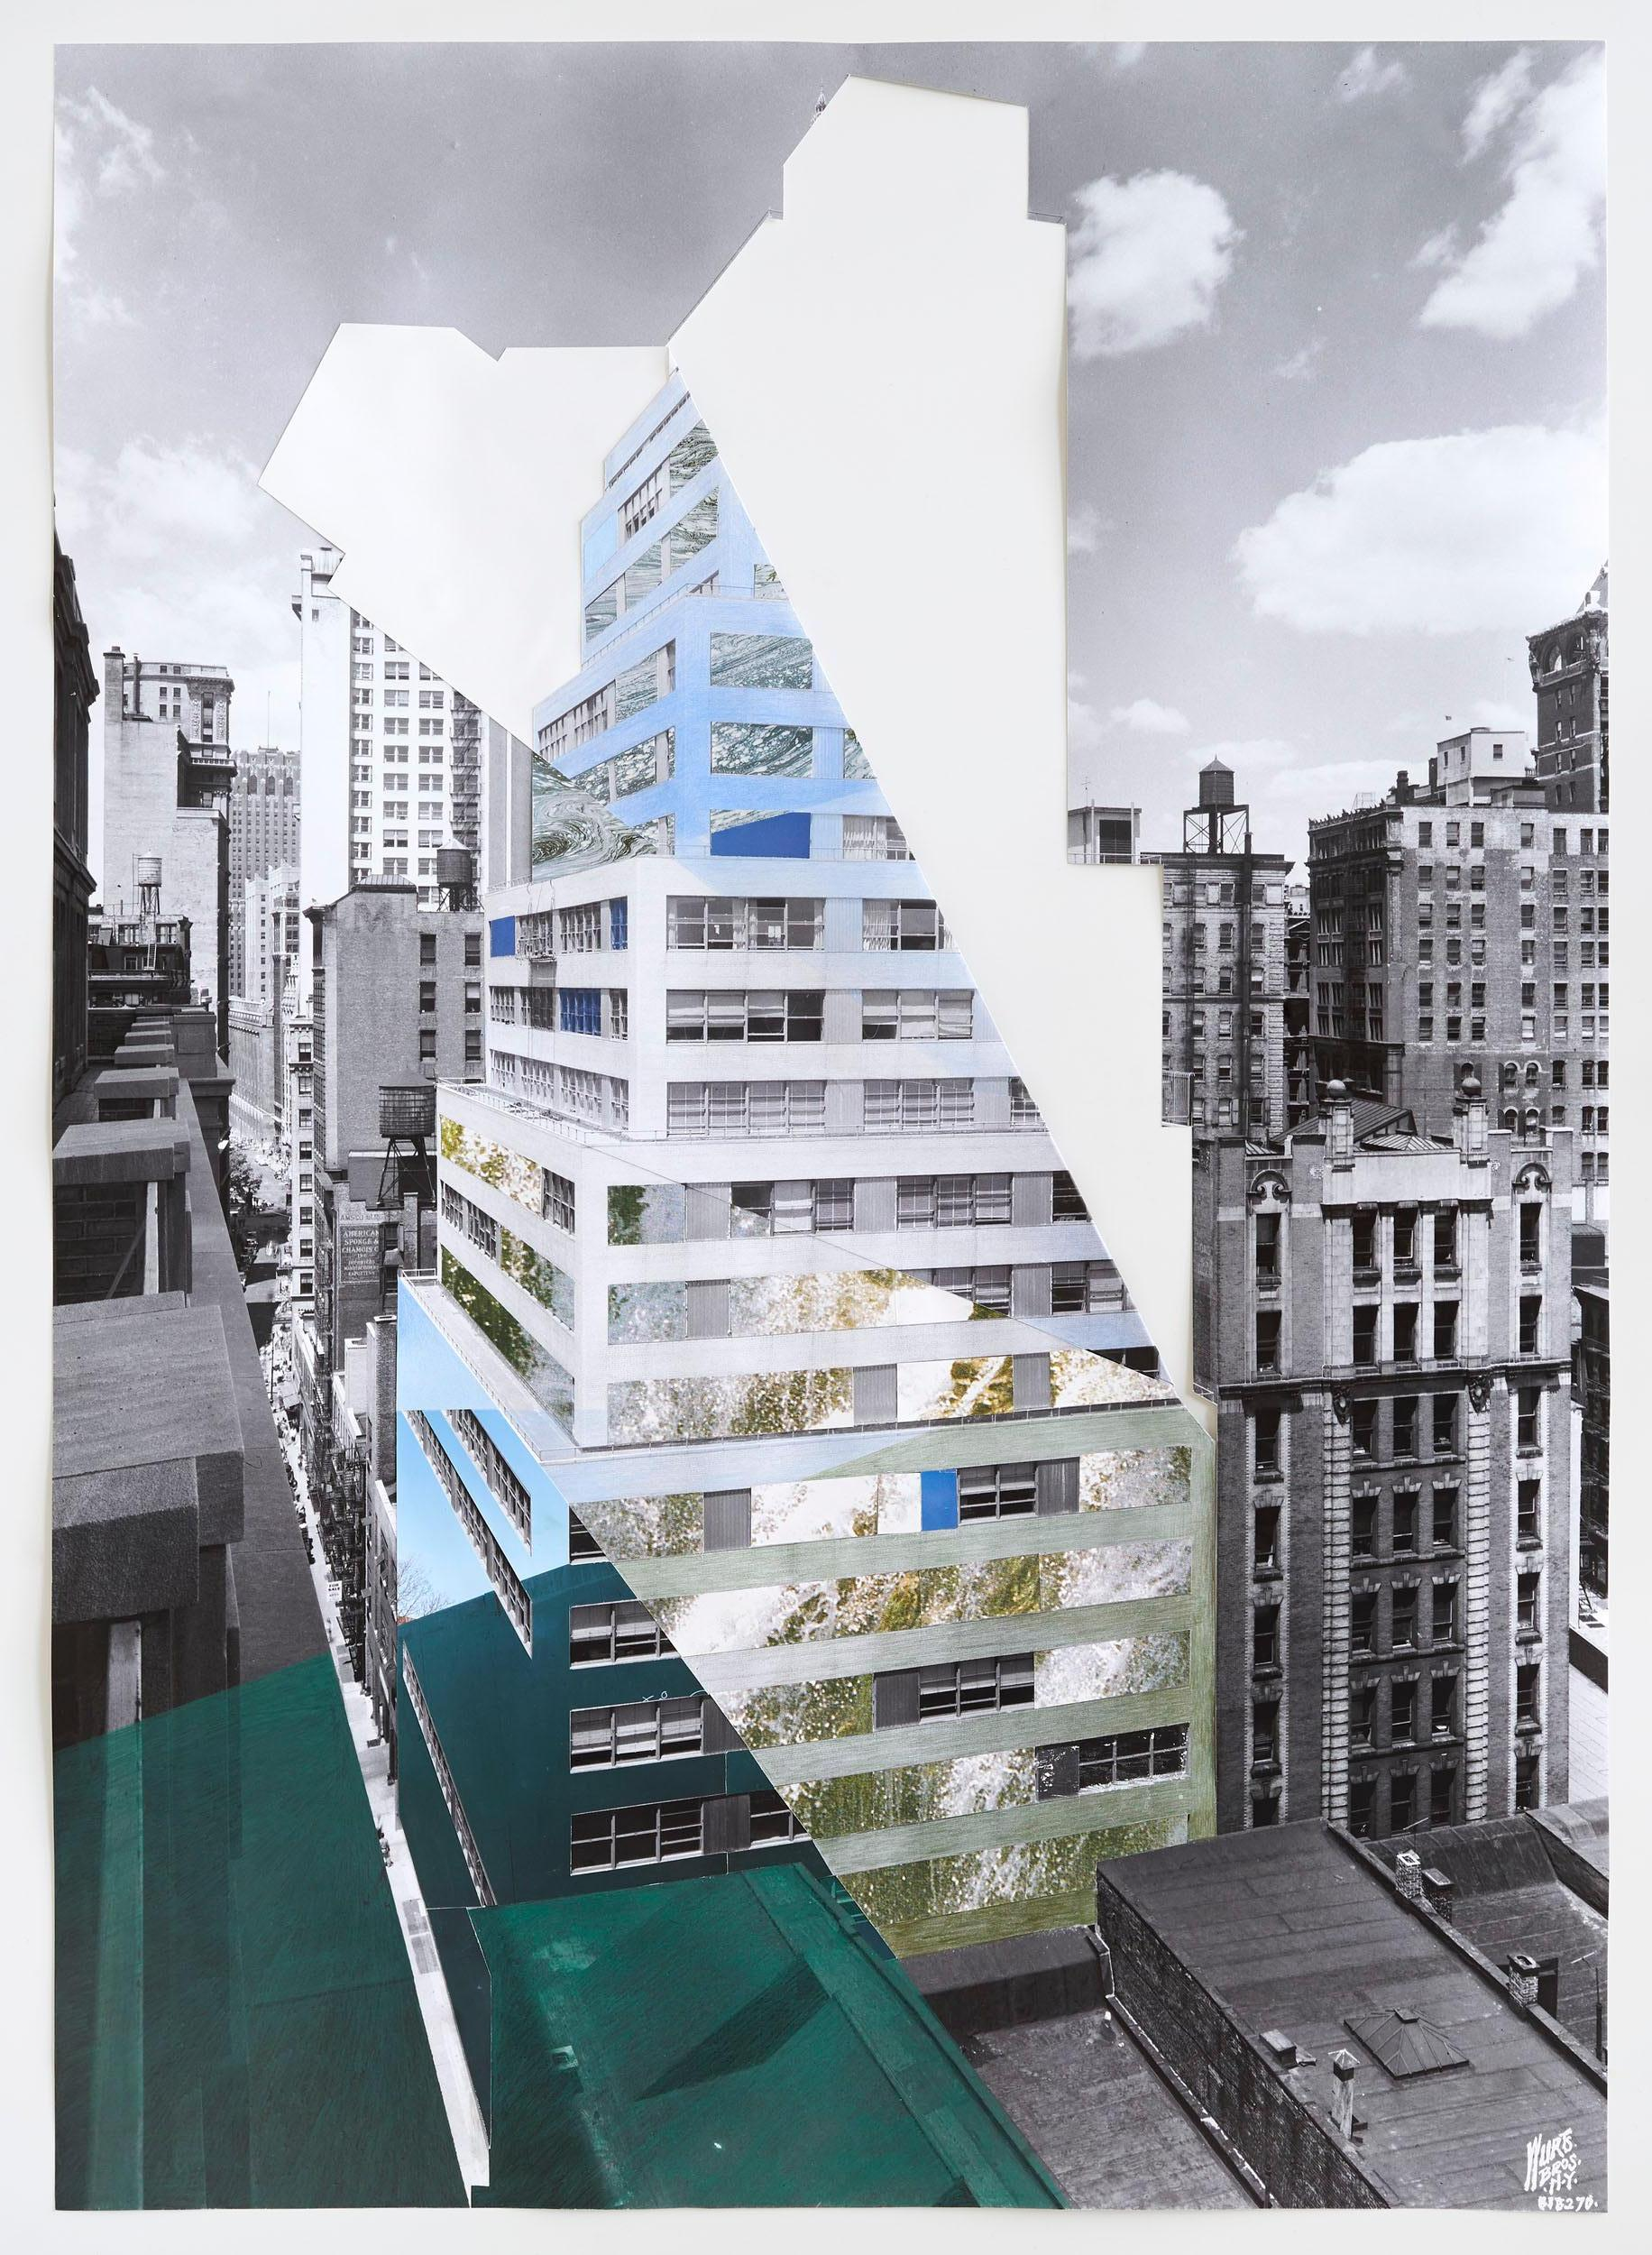 Turn, Architecture, New York City, William Street